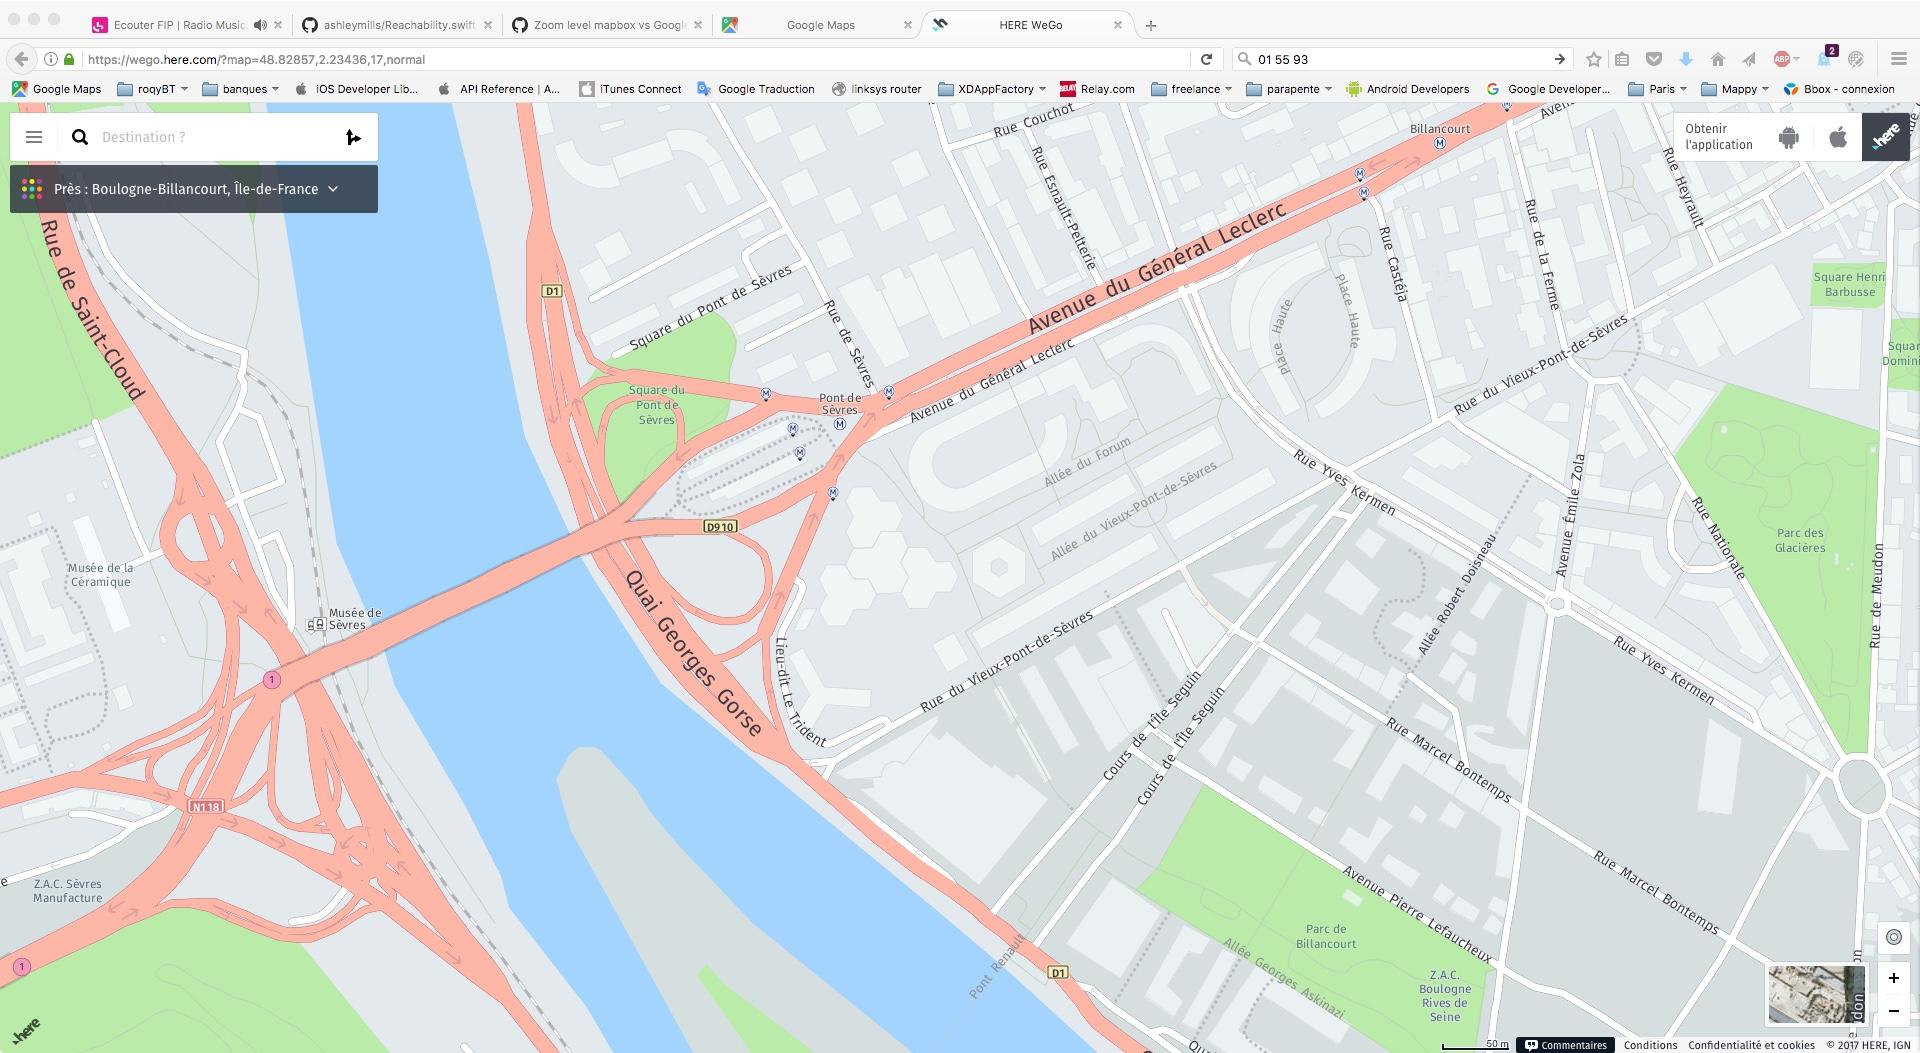 Zoom level mapbox vs GoogleMaps web · Issue #9417 · mapbox/mapbox-gl